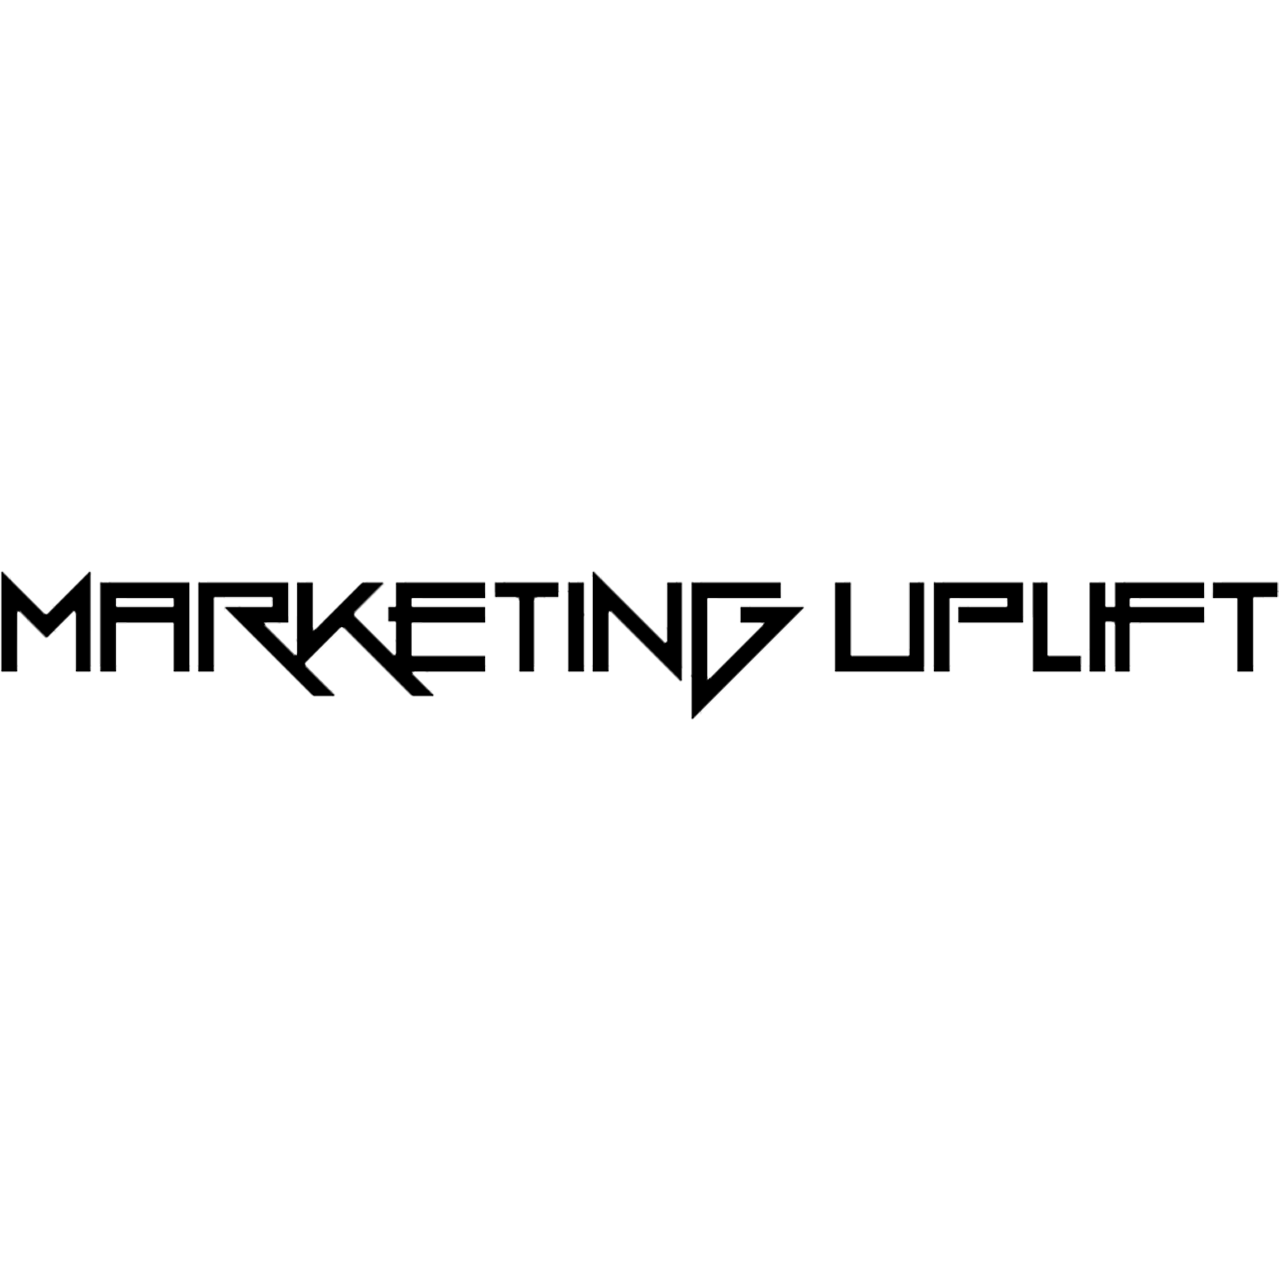 Bild zu Marketing Uplift - Social Media Agentur Krefeld in Krefeld